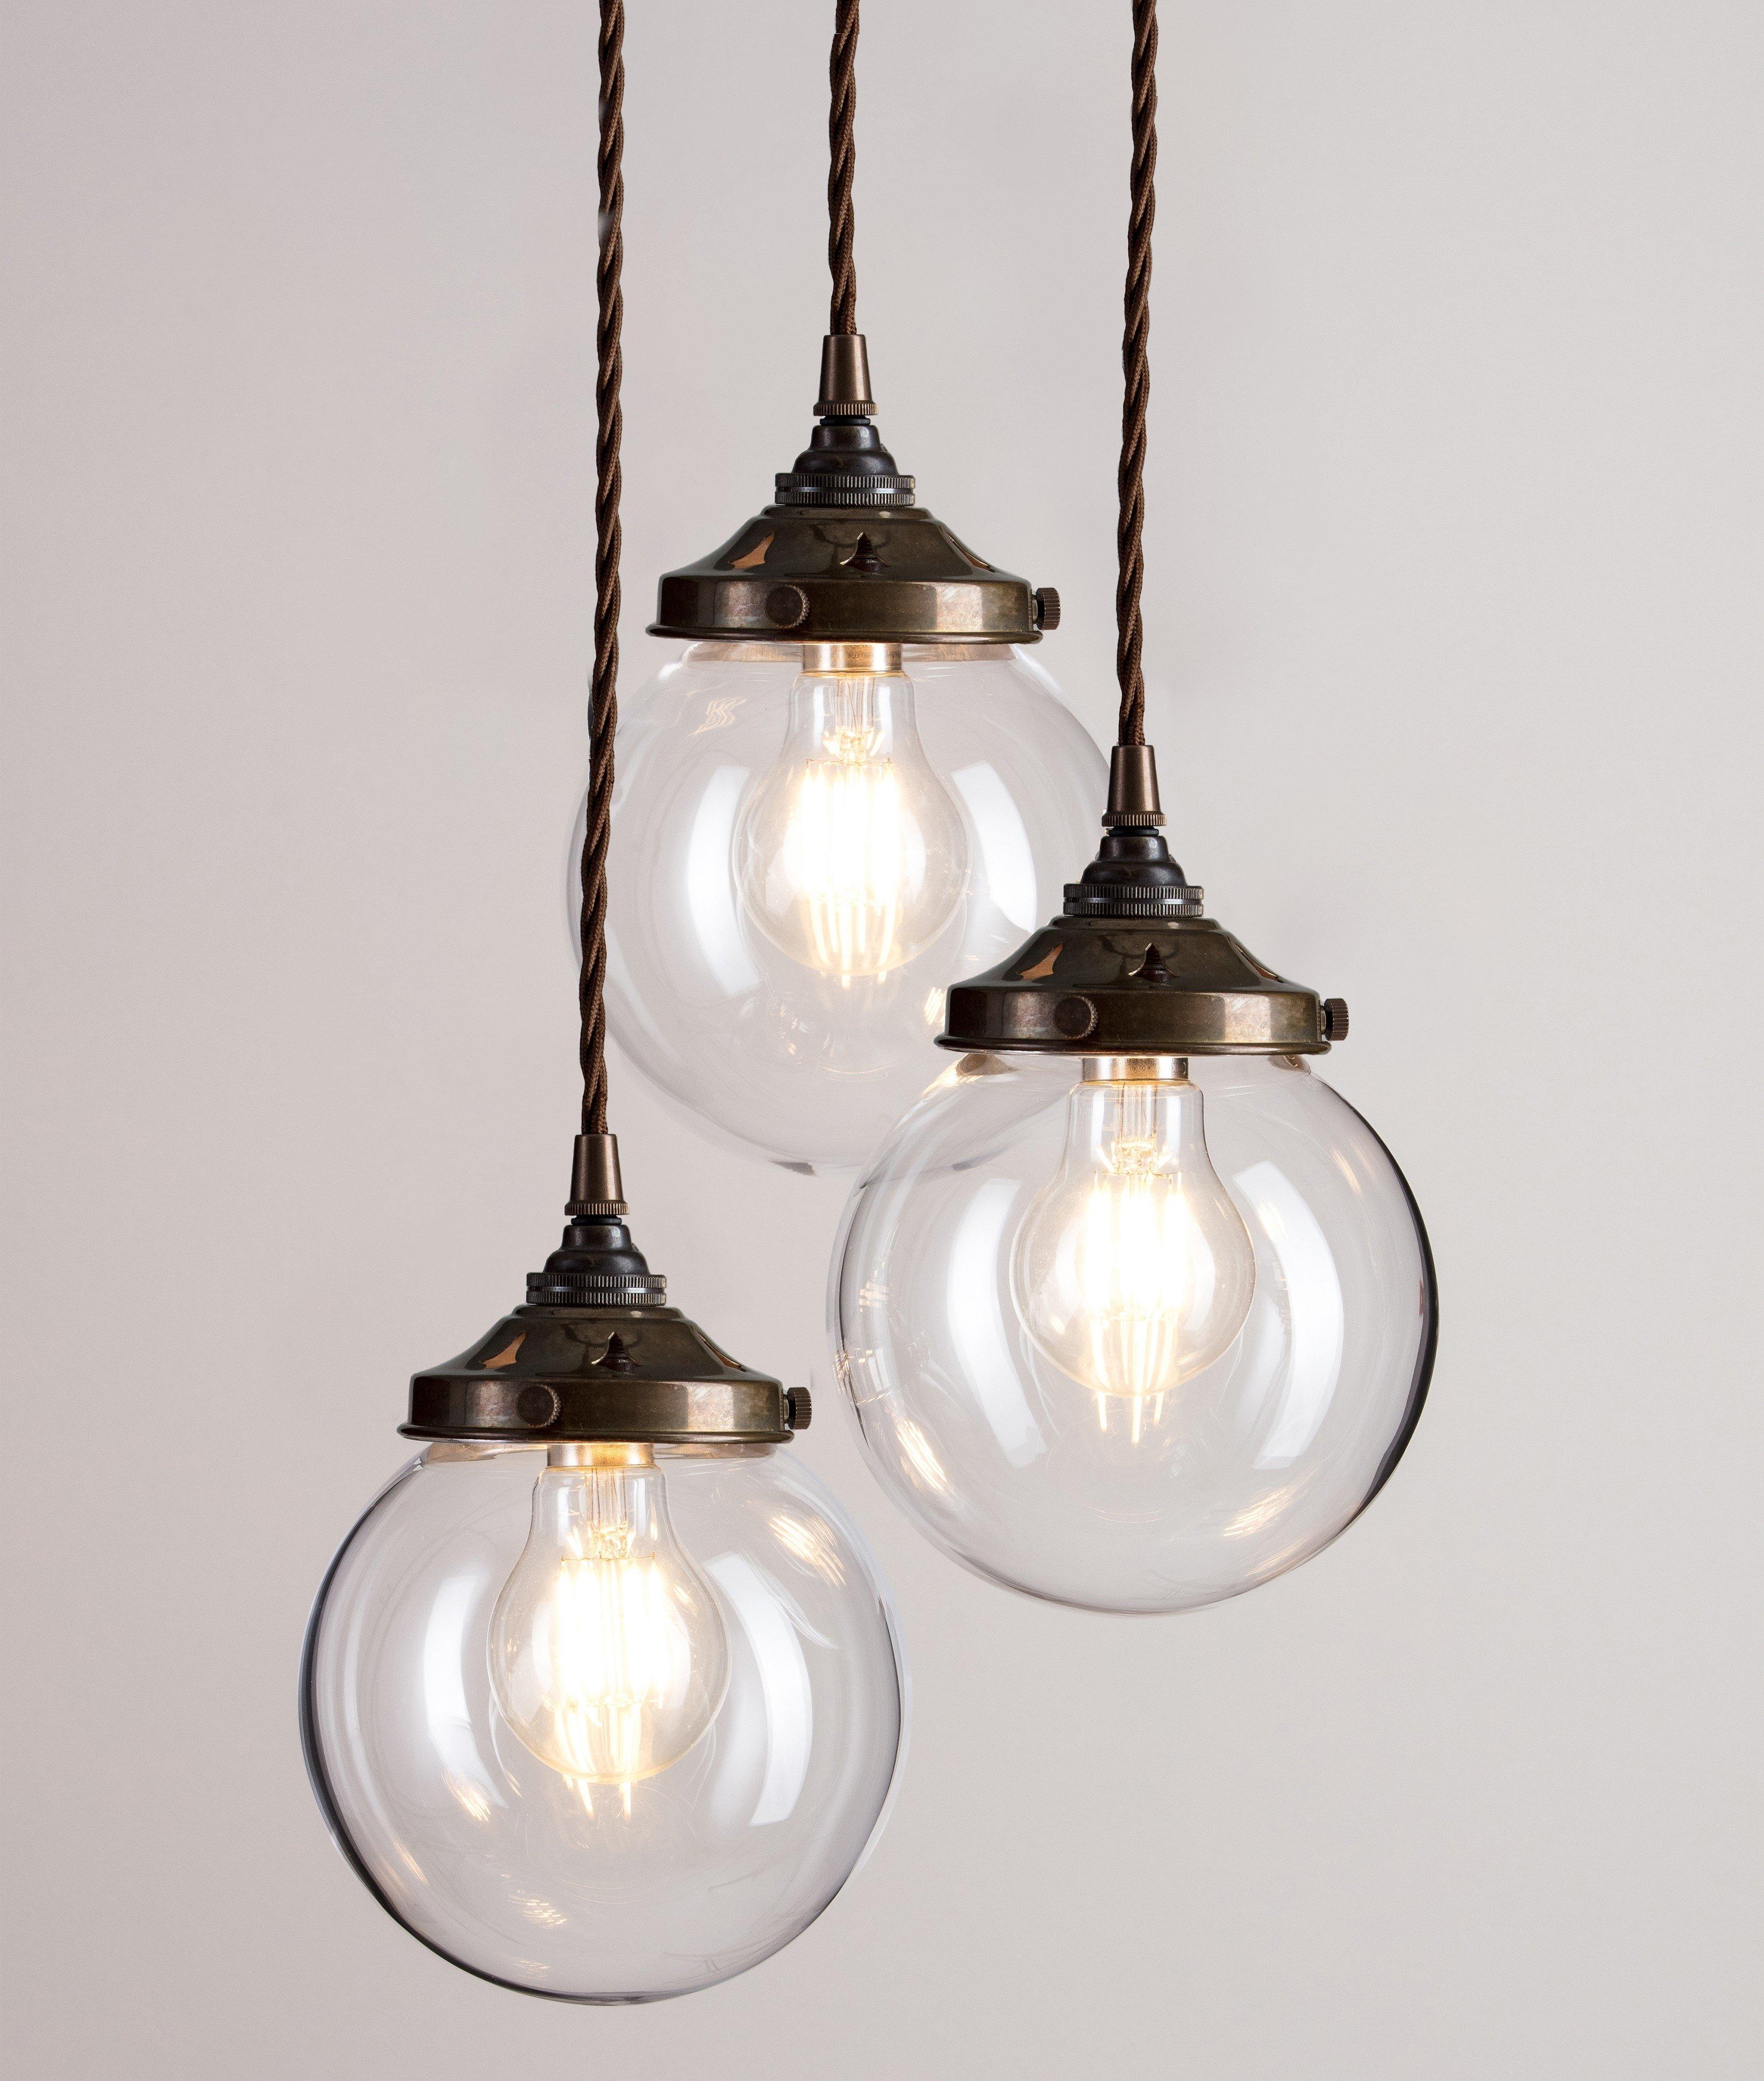 Glass Globe Cluster Pendant Light - Antique Brass